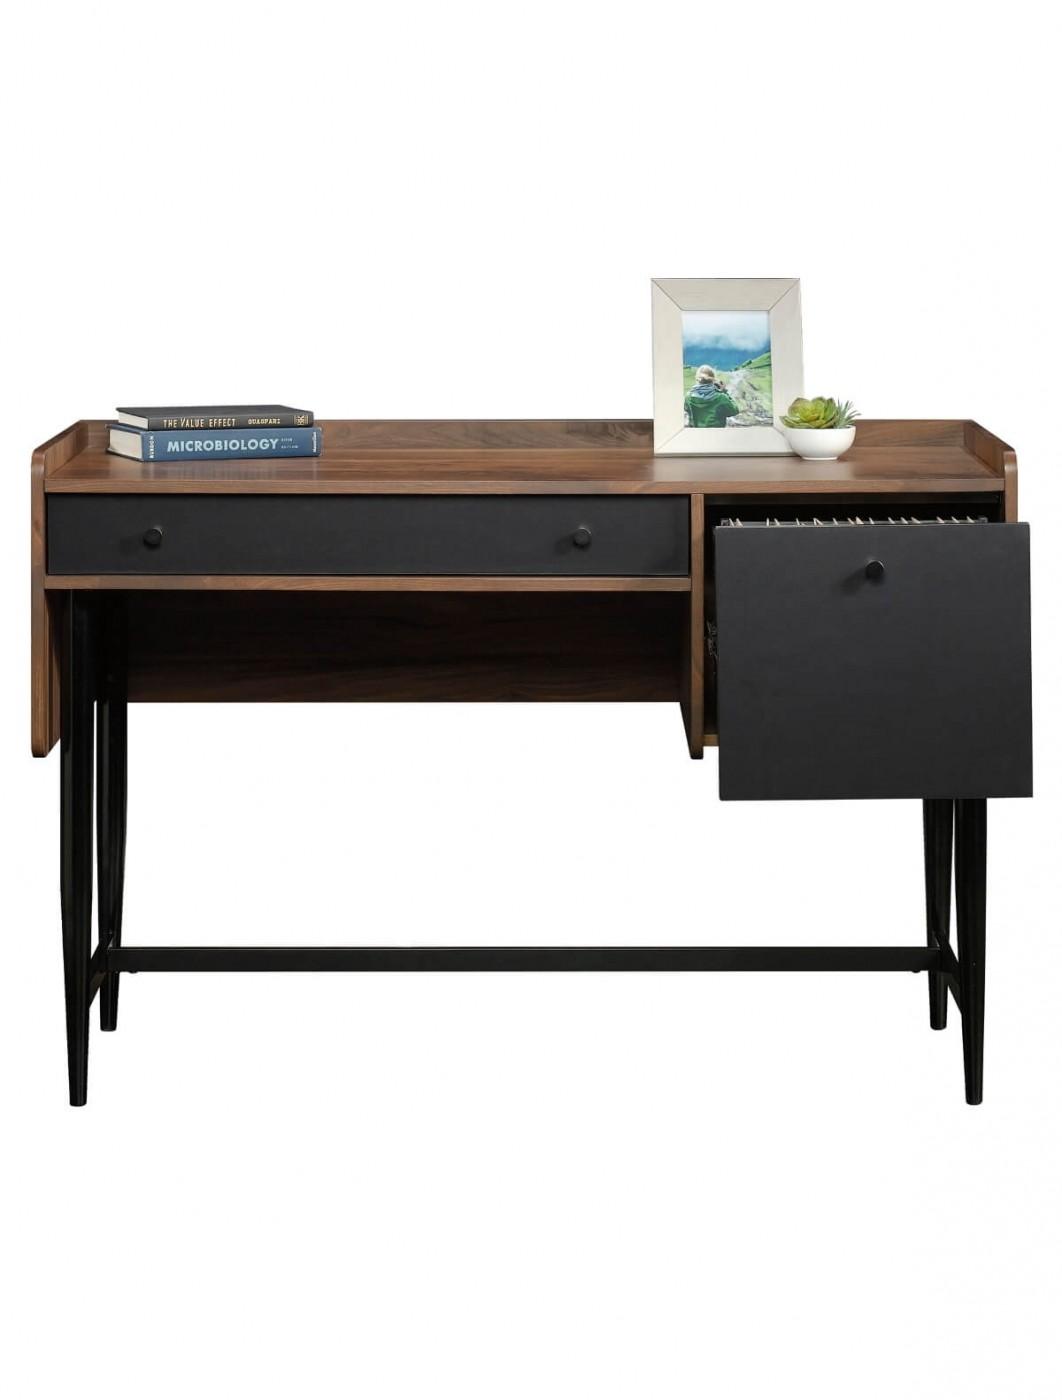 Image of: Office Desk Walnut For Stillo Walnut And Grey Large Computer Office Desk 004625x